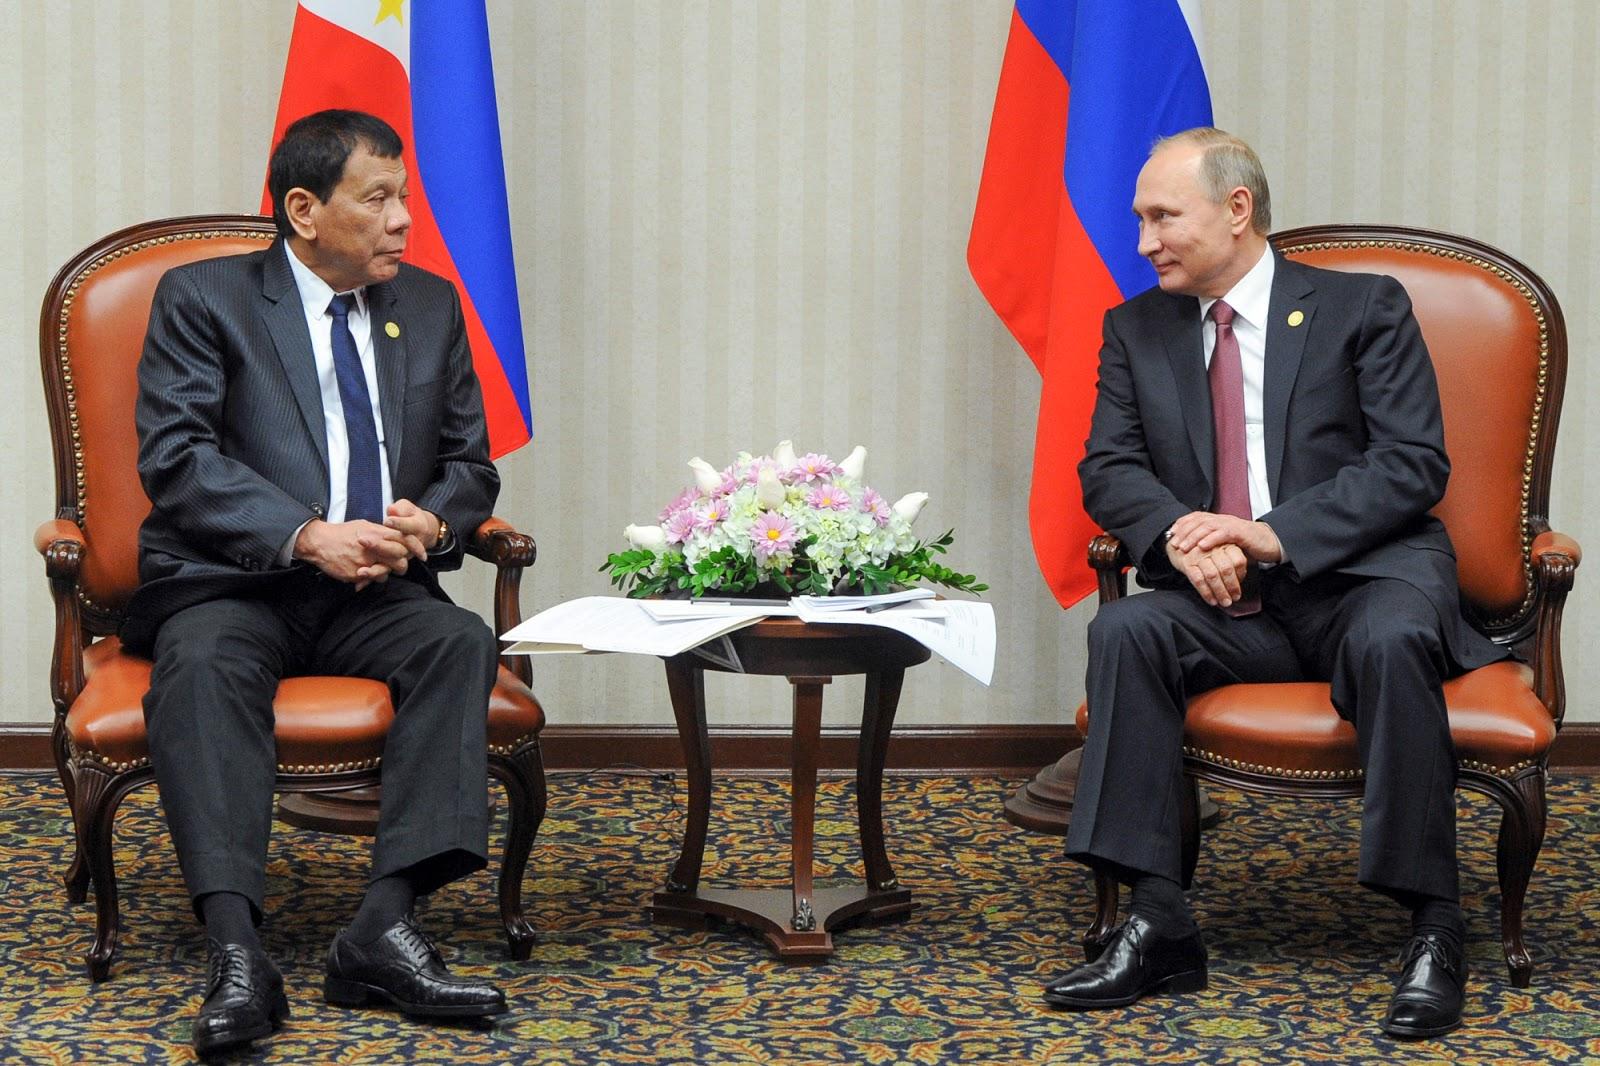 Philippine President Rodrigo Roa Duterte meeting with Russian President Putin